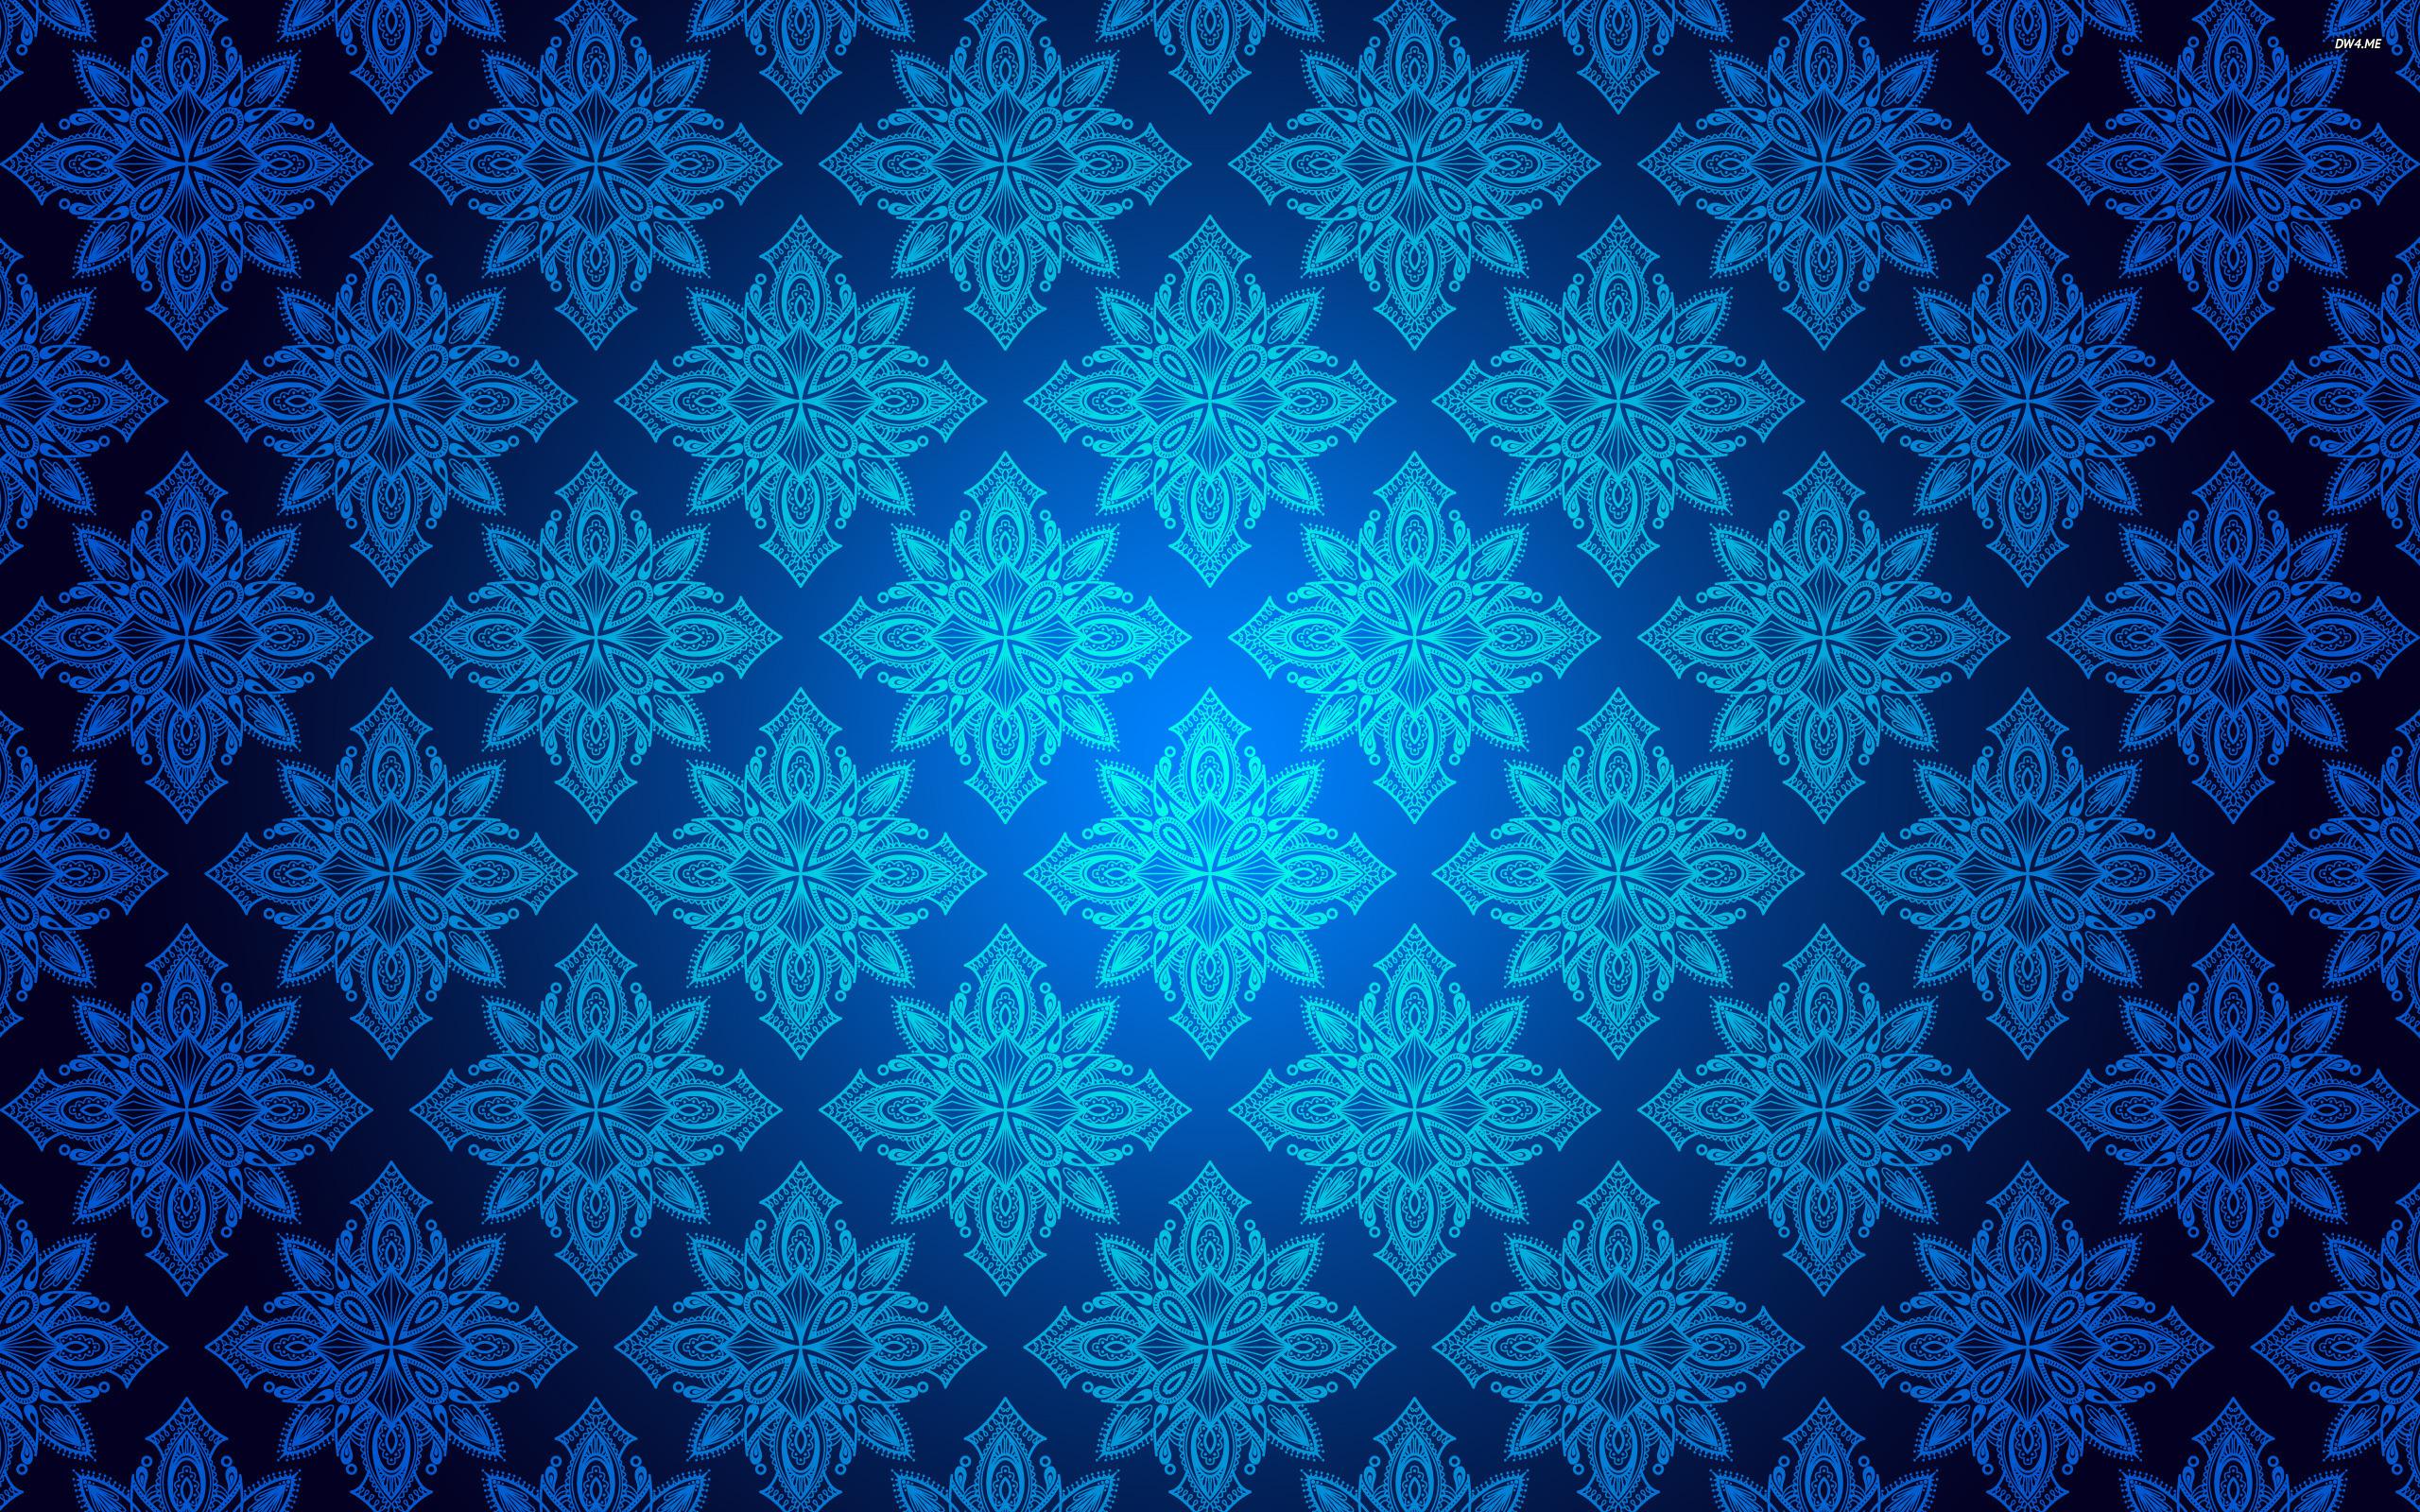 royal blue wallpaper tumblr - photo #42